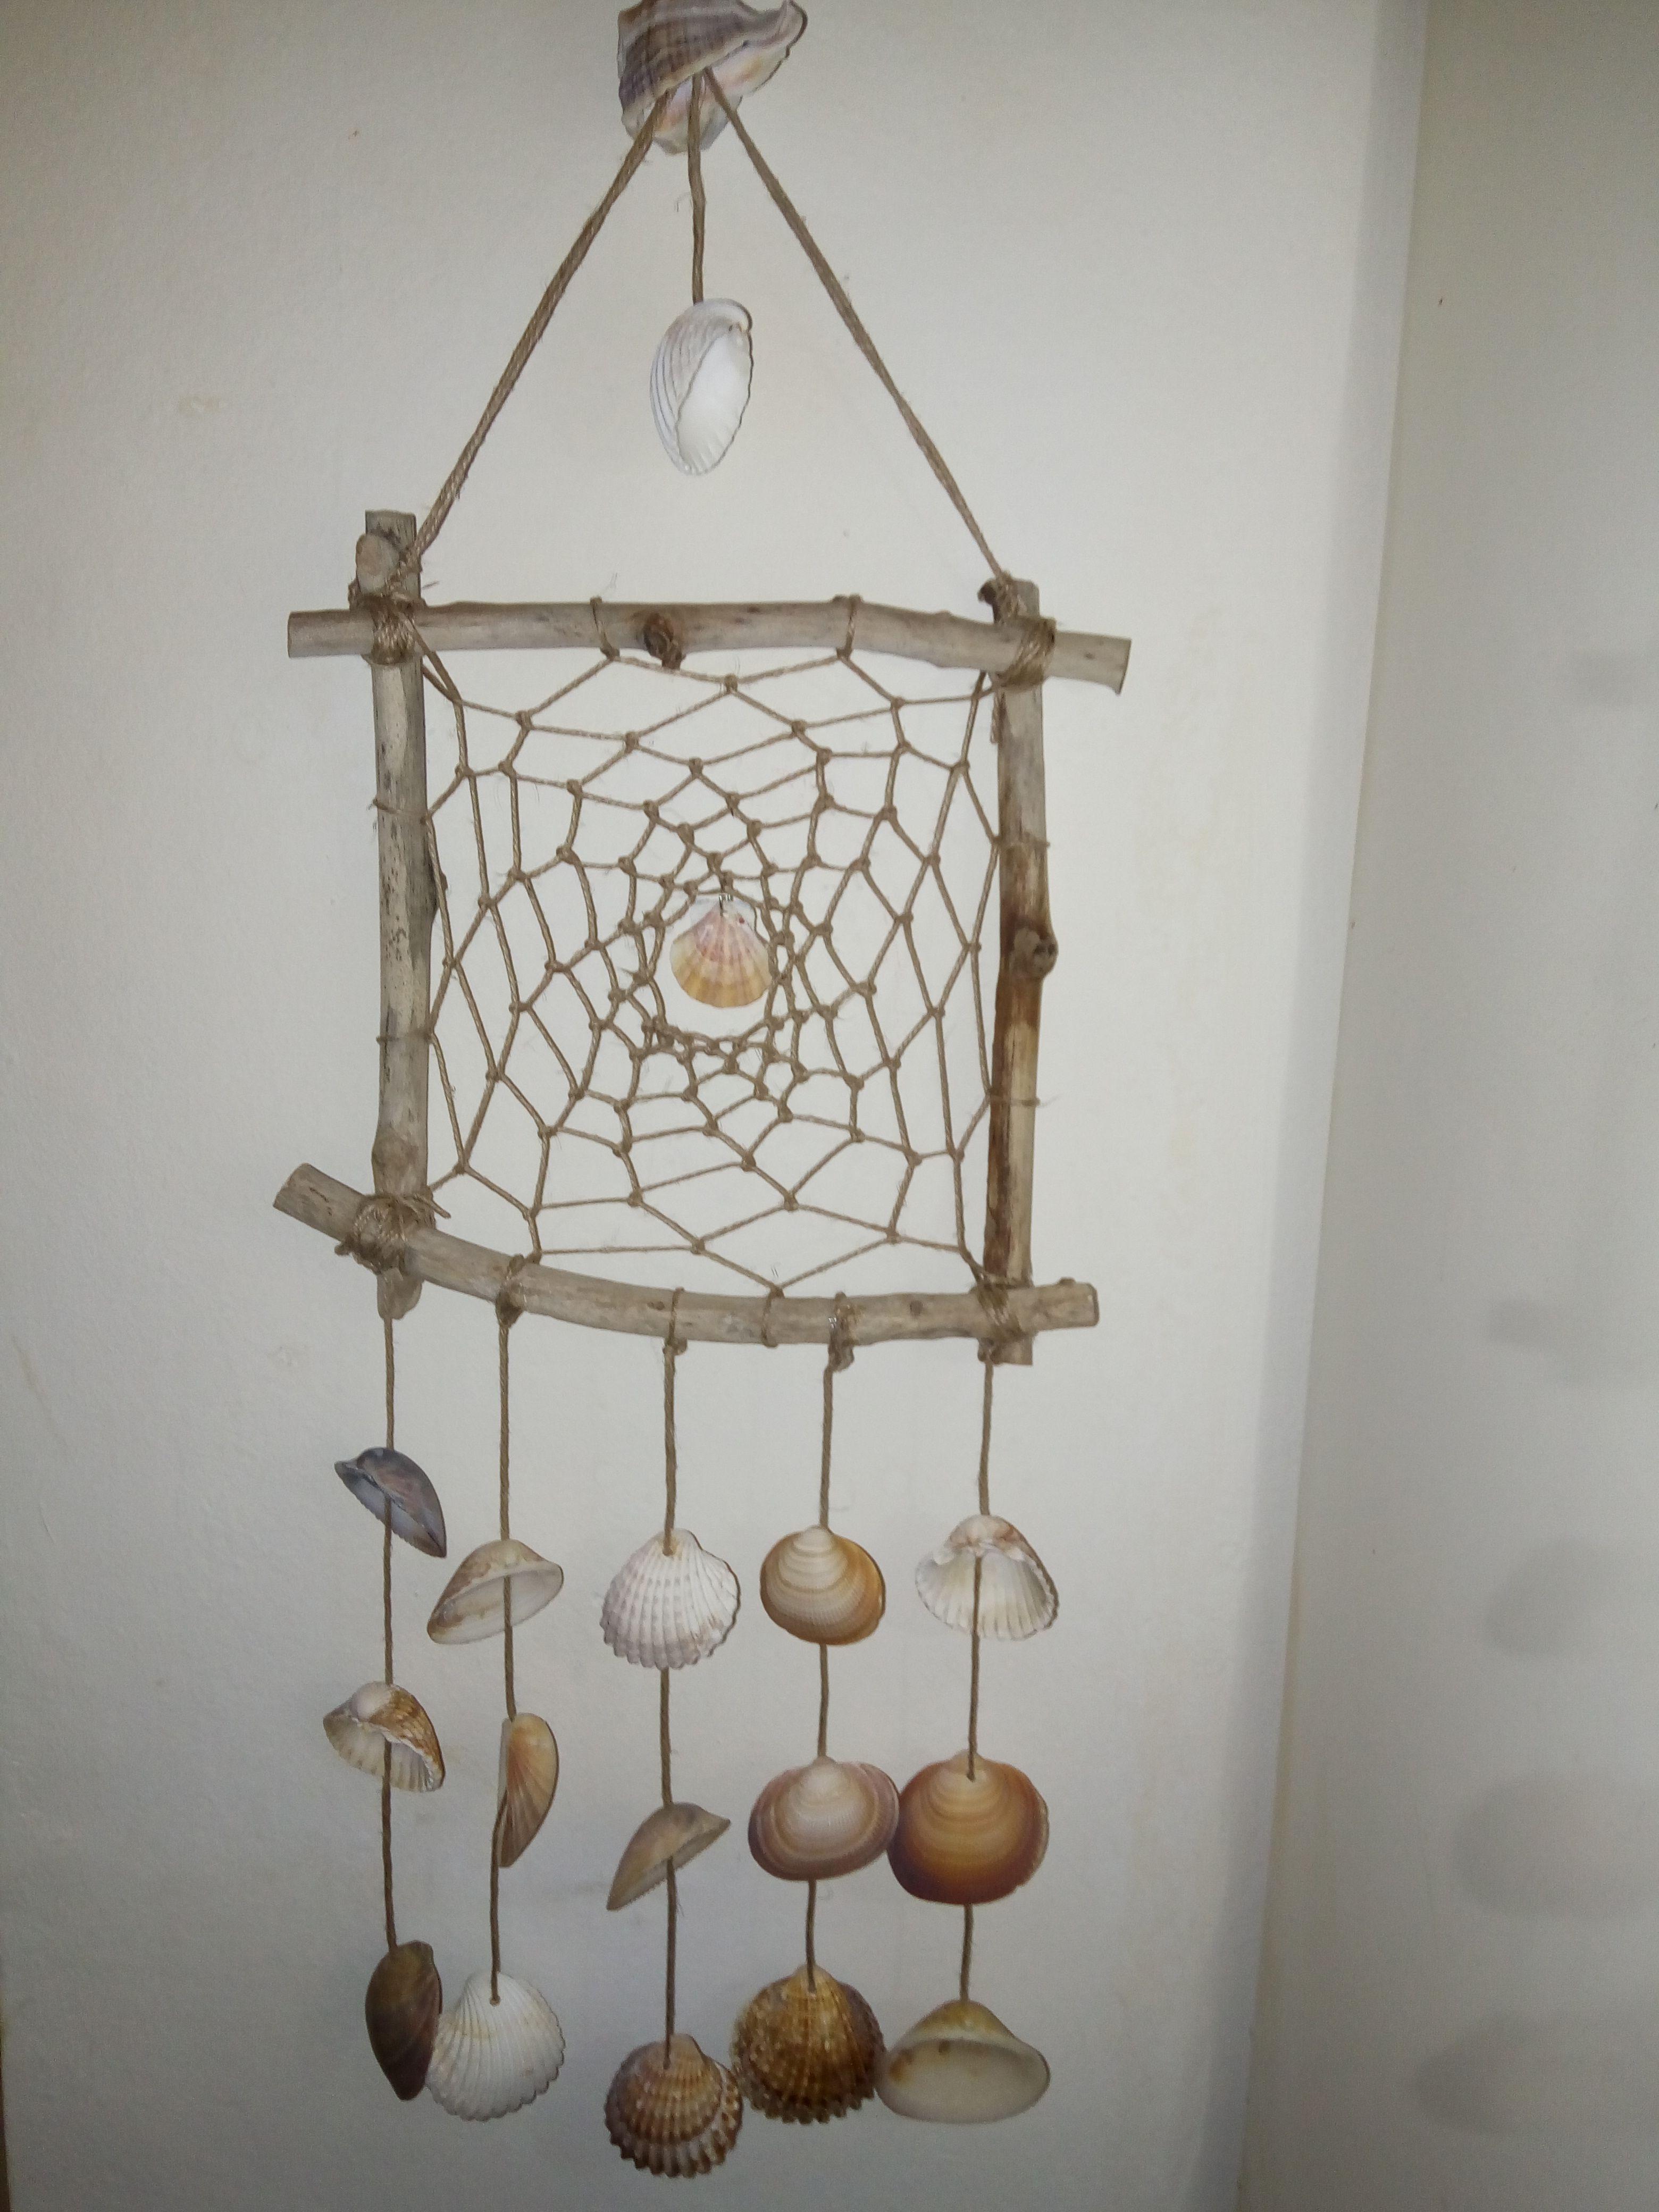 Rustic wind chimes shells diy seashells crafts my for Shell wind chimes diy